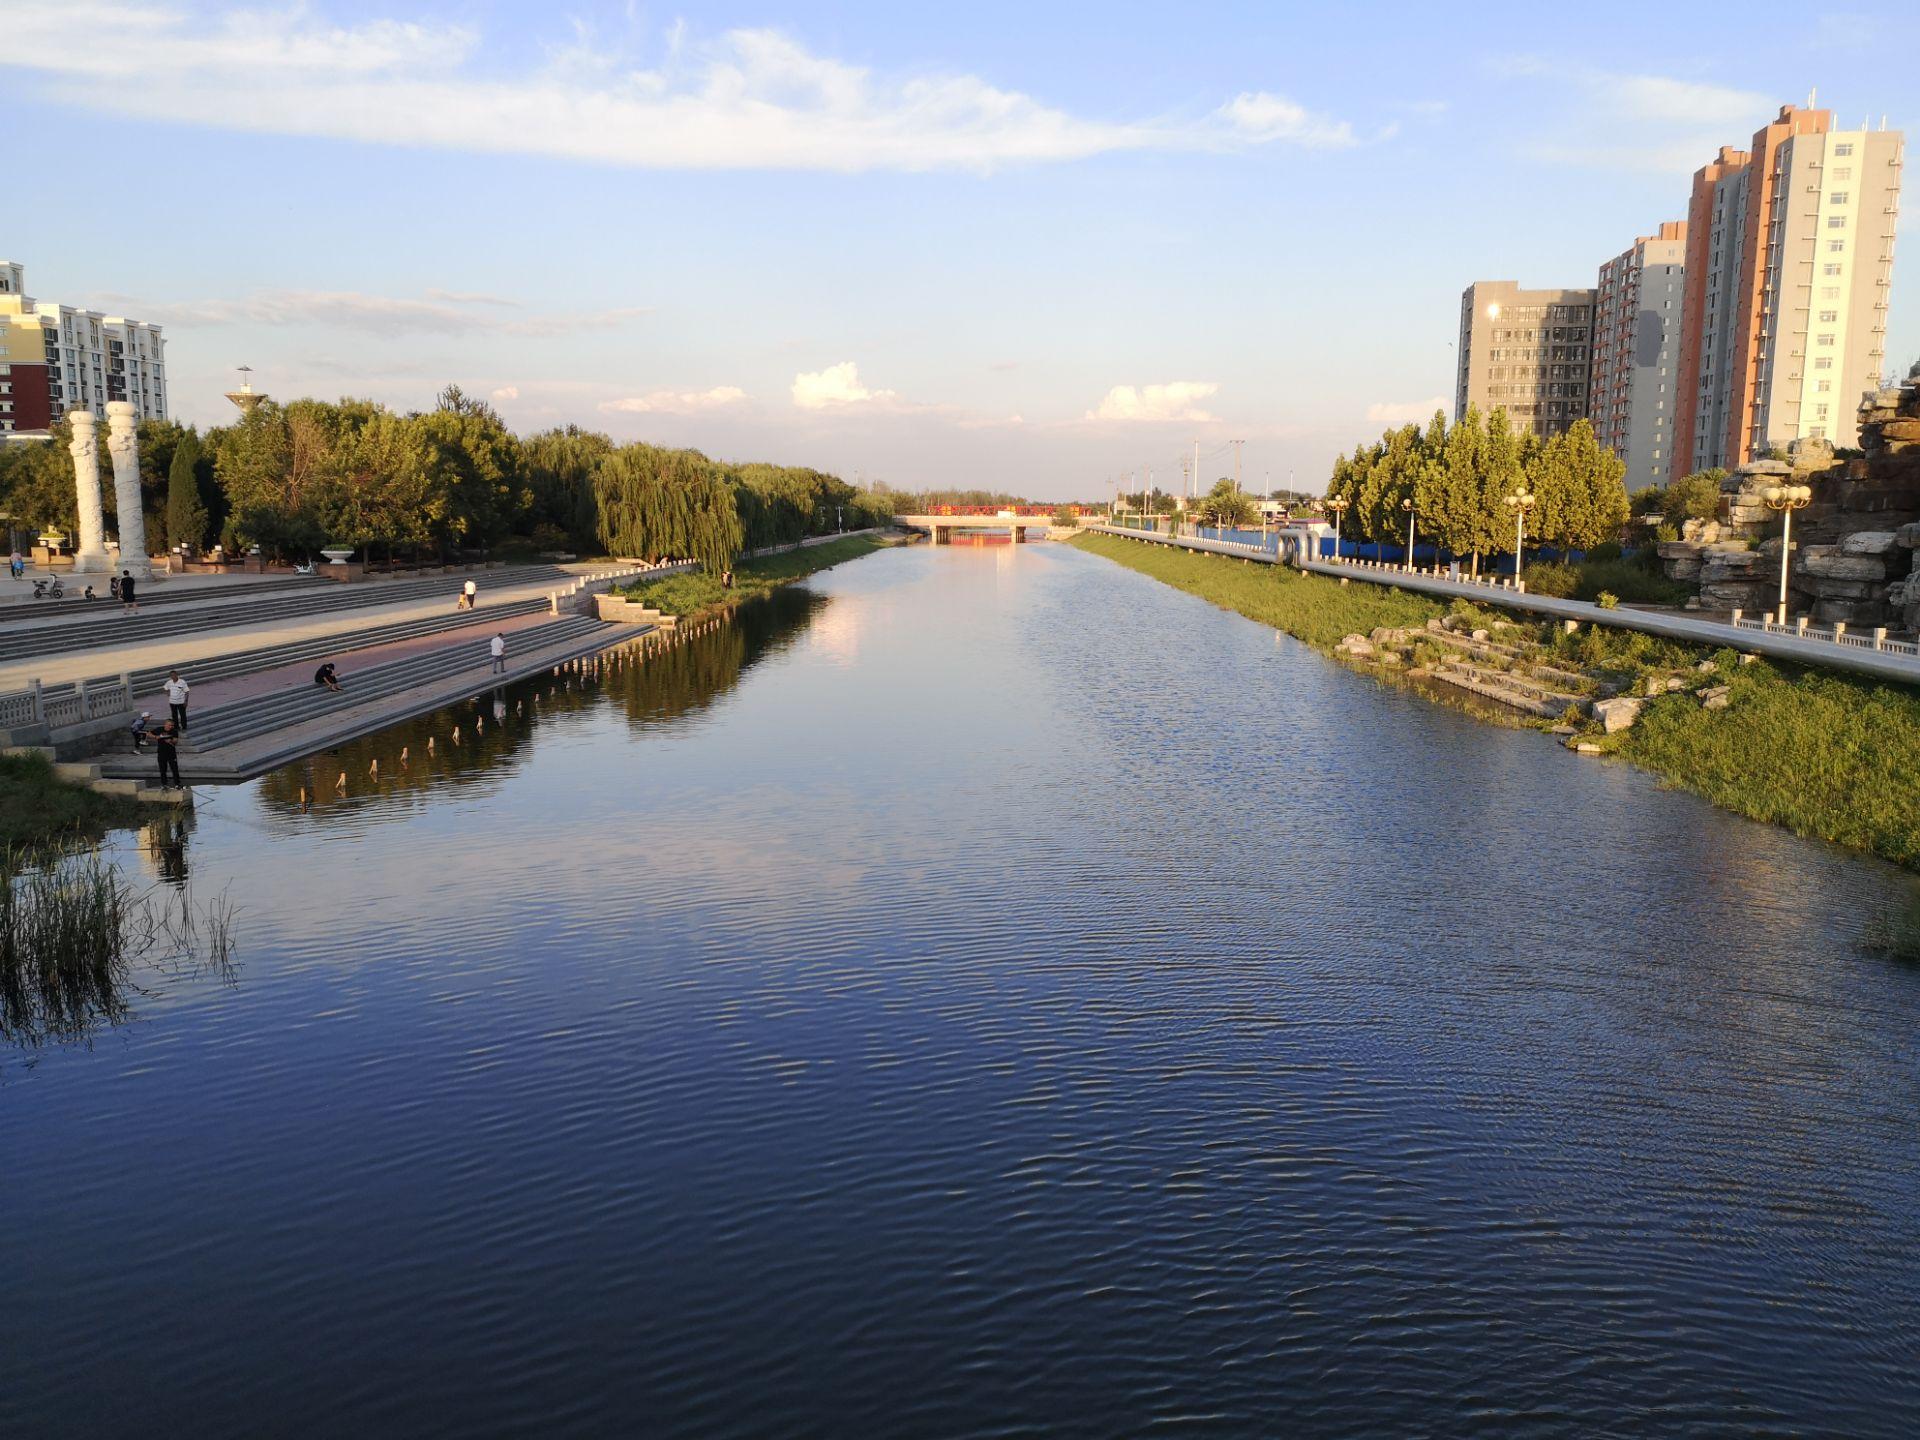 Huangdu Hot Spring City